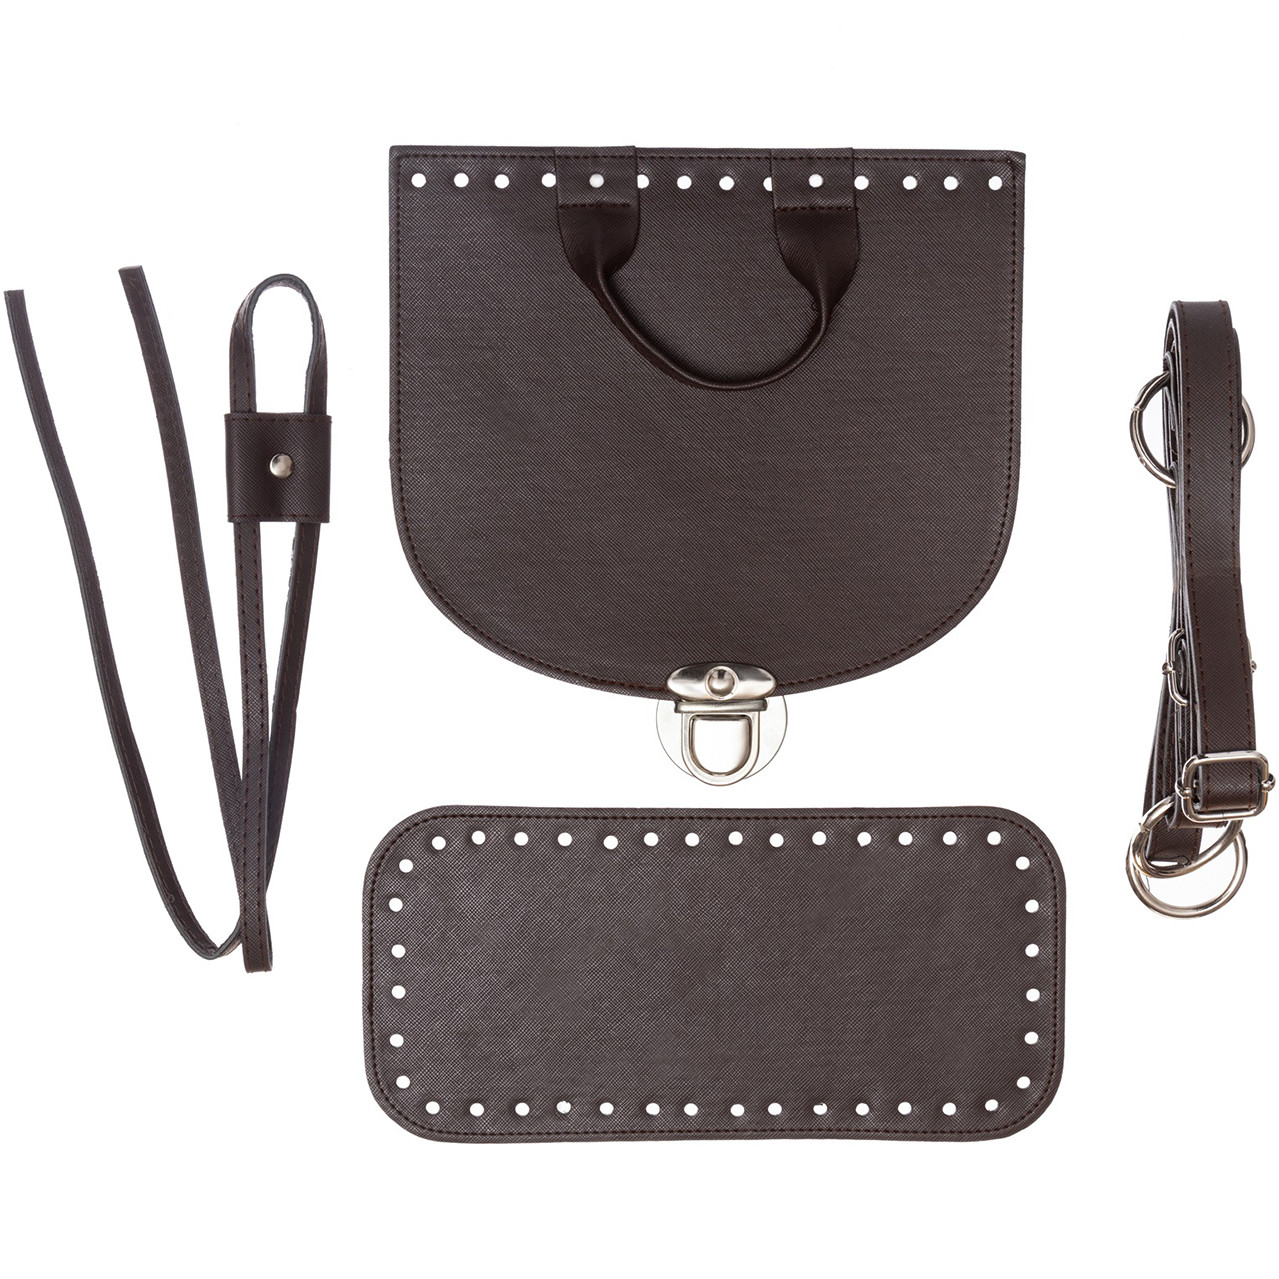 Набор для рюкзака экокожа Шоколад (5 позиций) фурнитура серебро